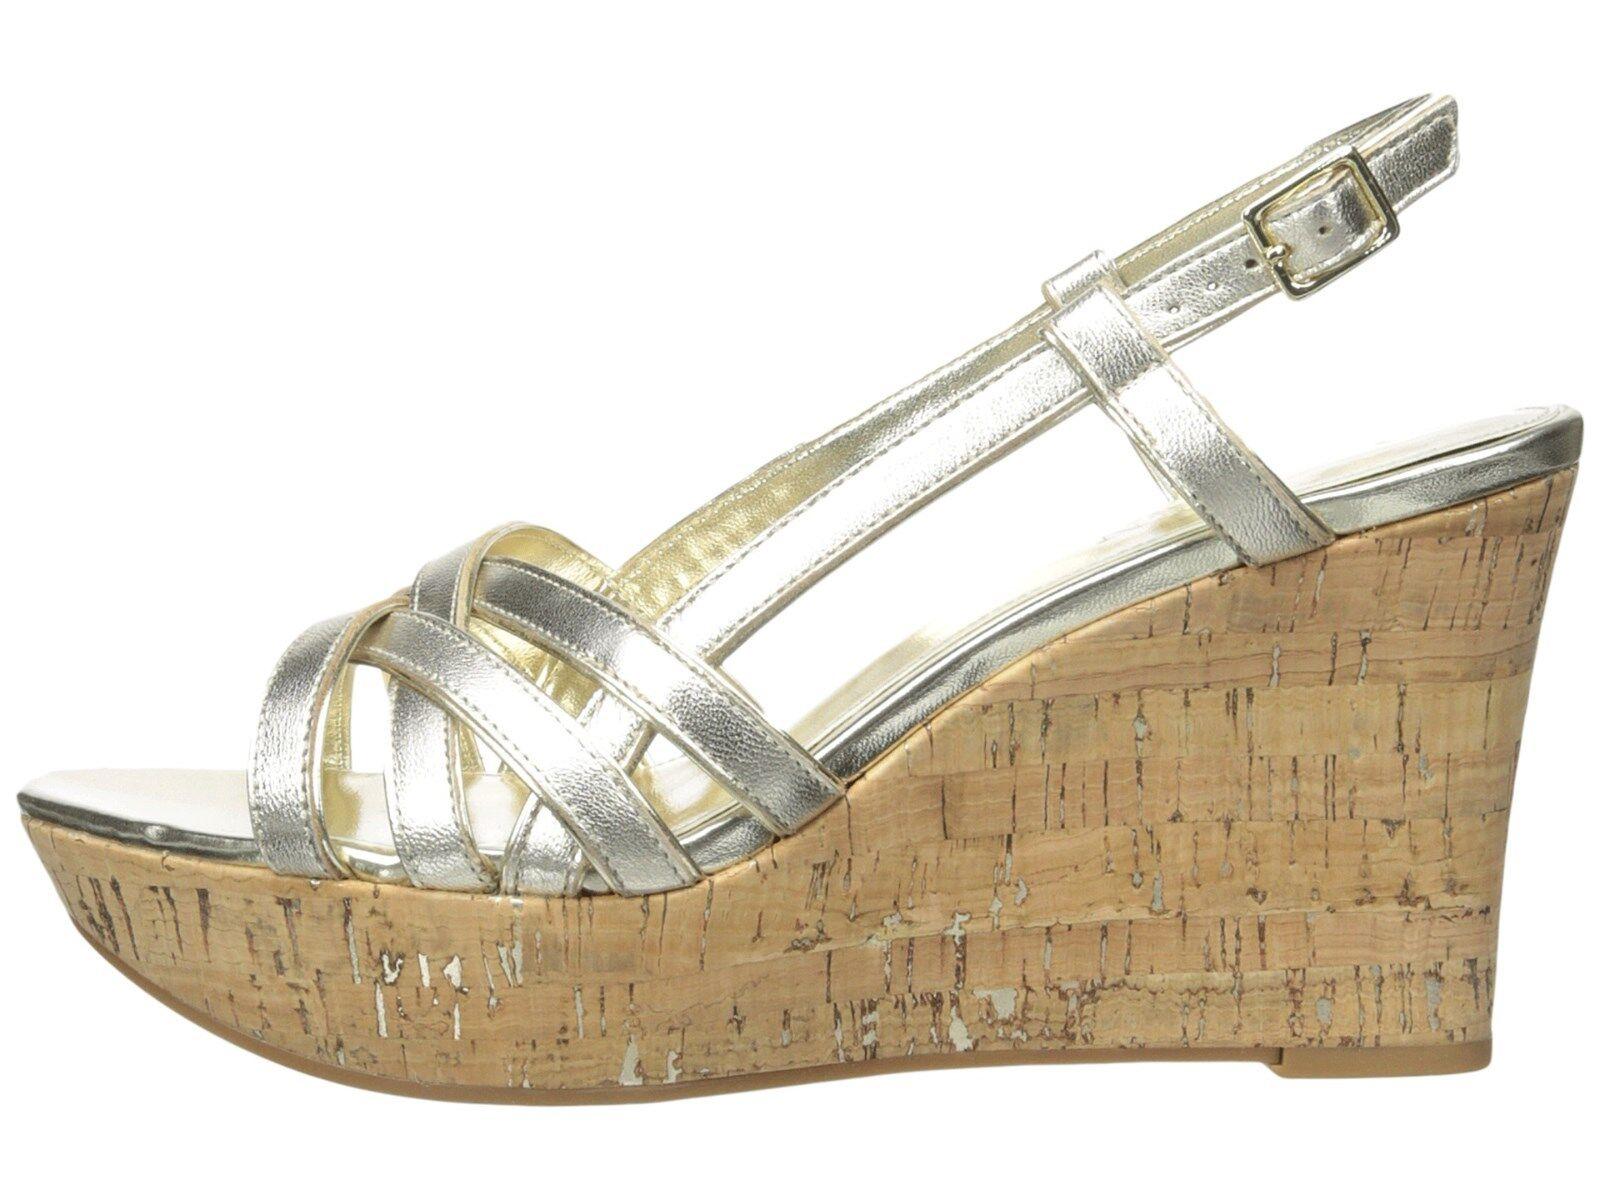 RALPH LAUREN QUAYLIN PLATINO METALLIC WEDGE SANDAL chaussures chaussures chaussures MULTITailleS AS292 58b200